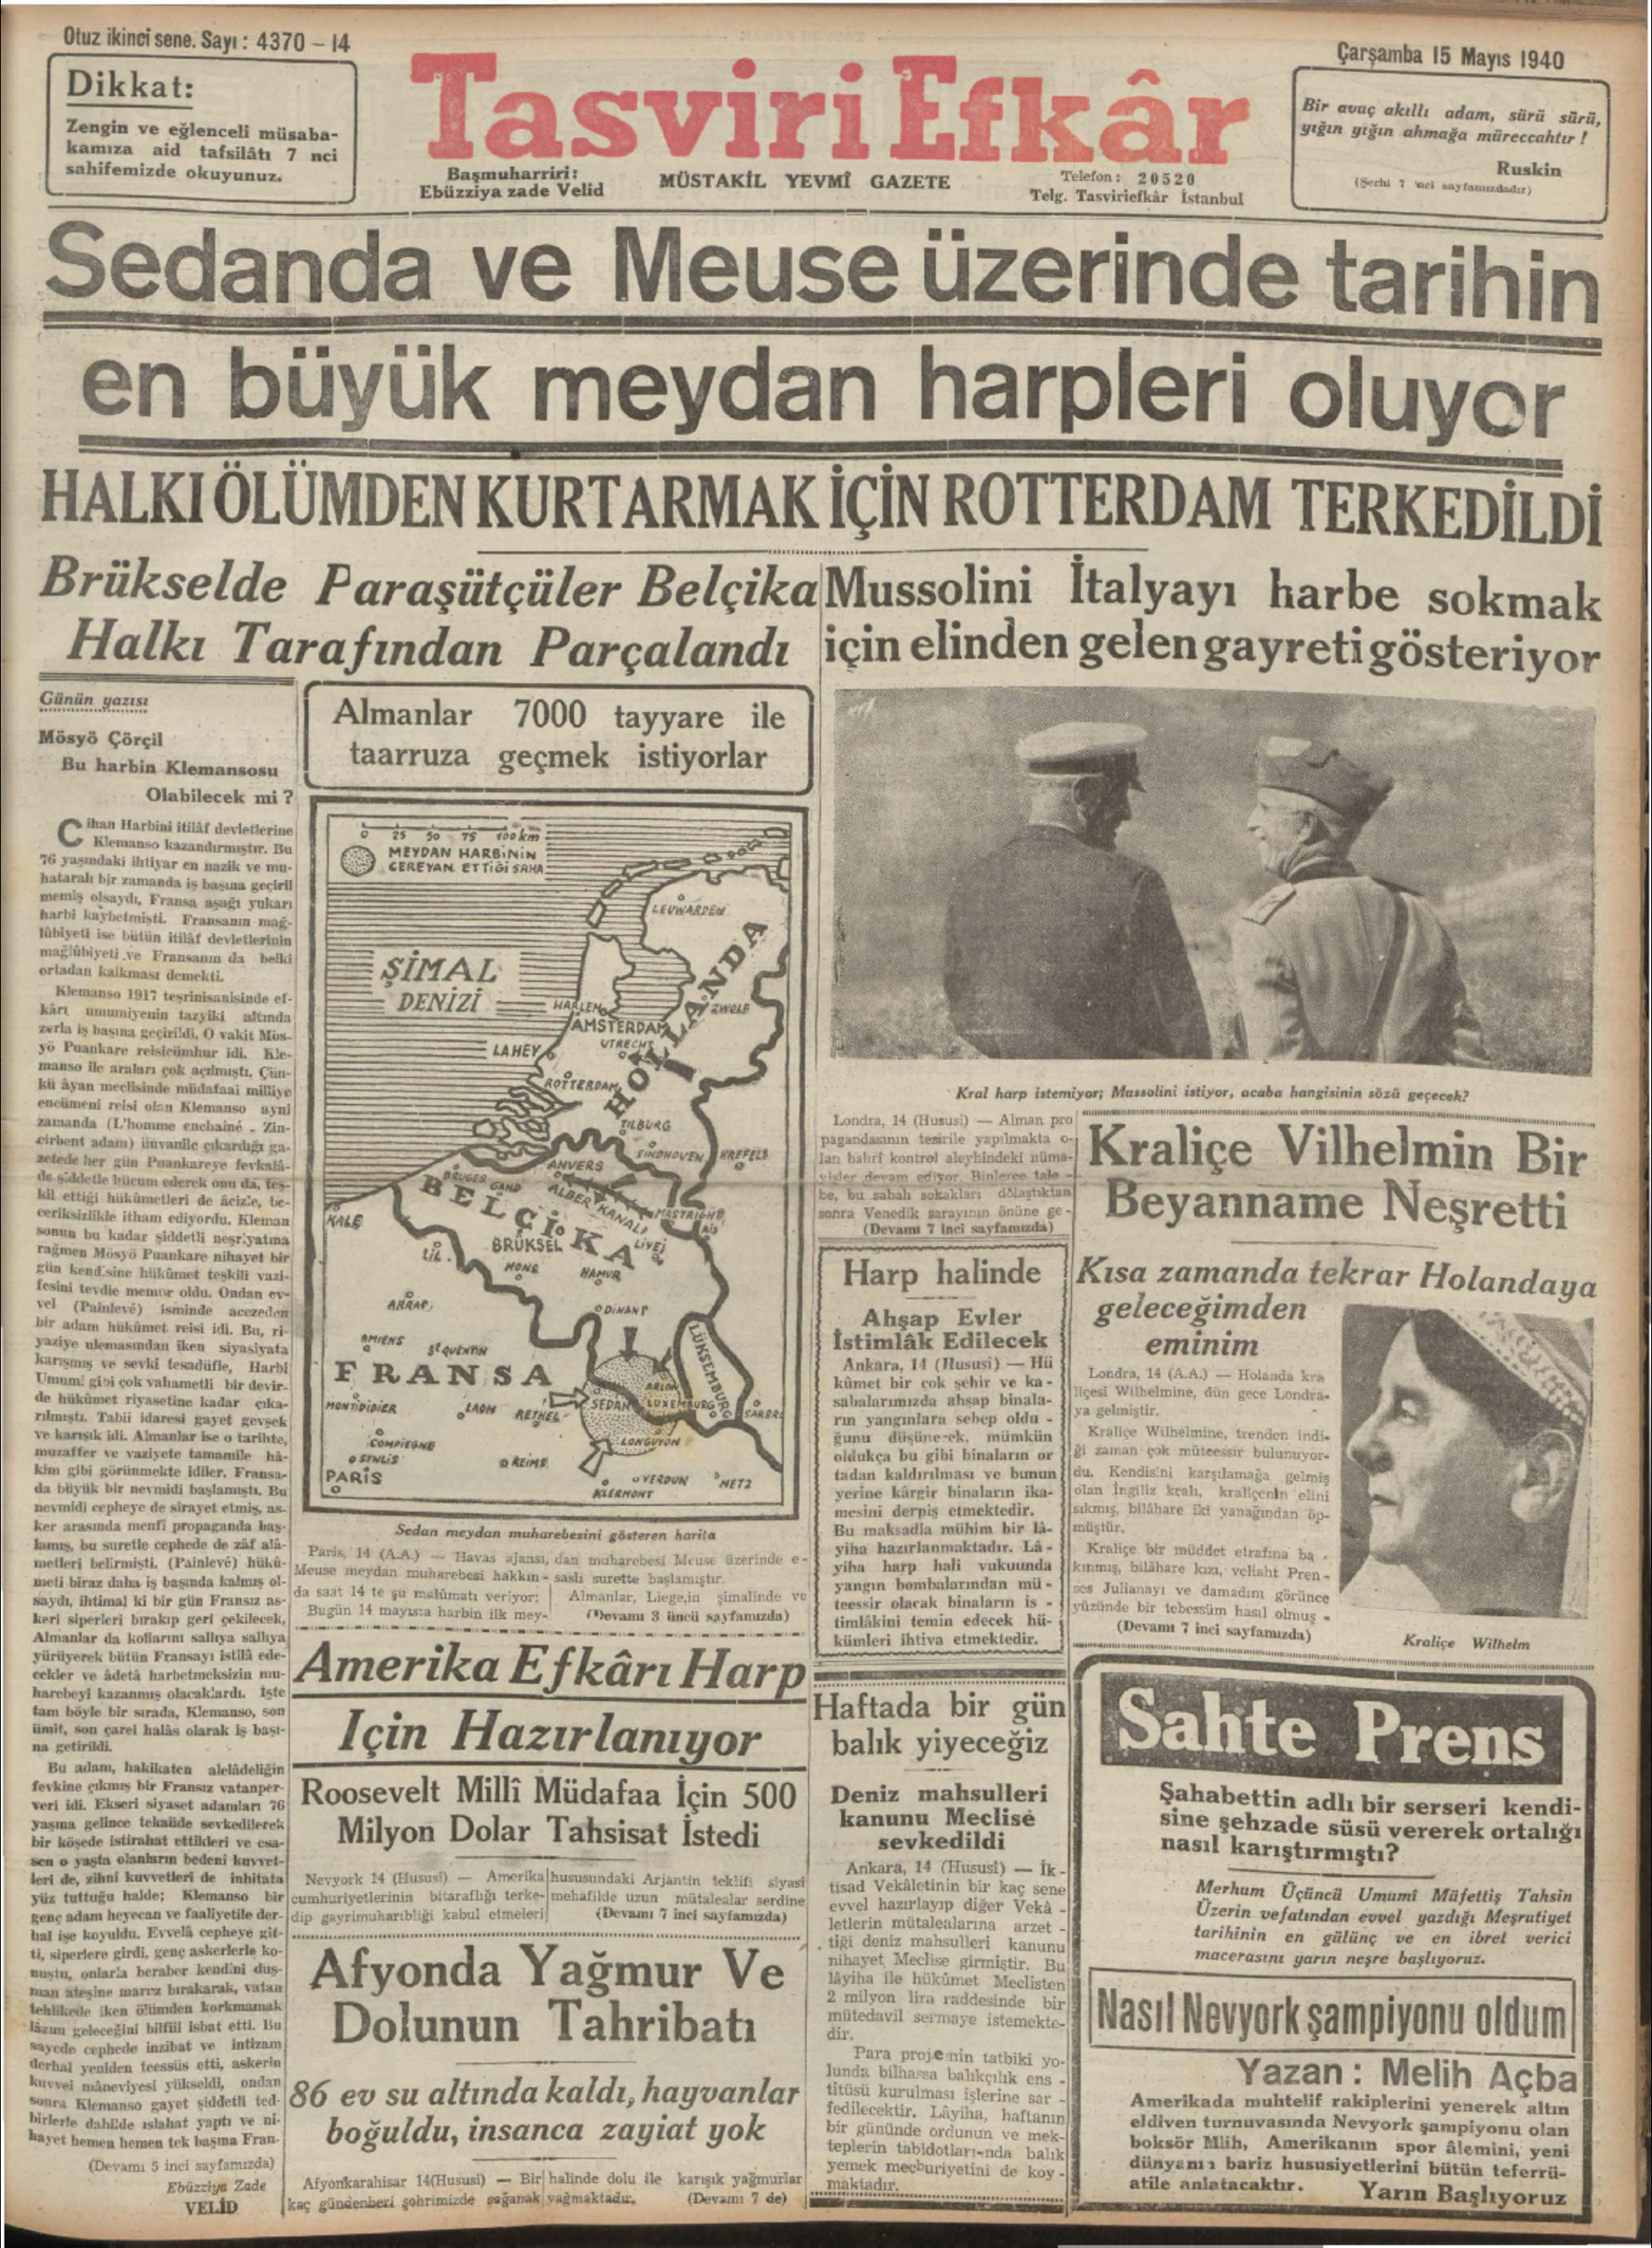 15 Mayıs 1940 Tarihli Tasviri Efkar Gazetesi Sayfa 1